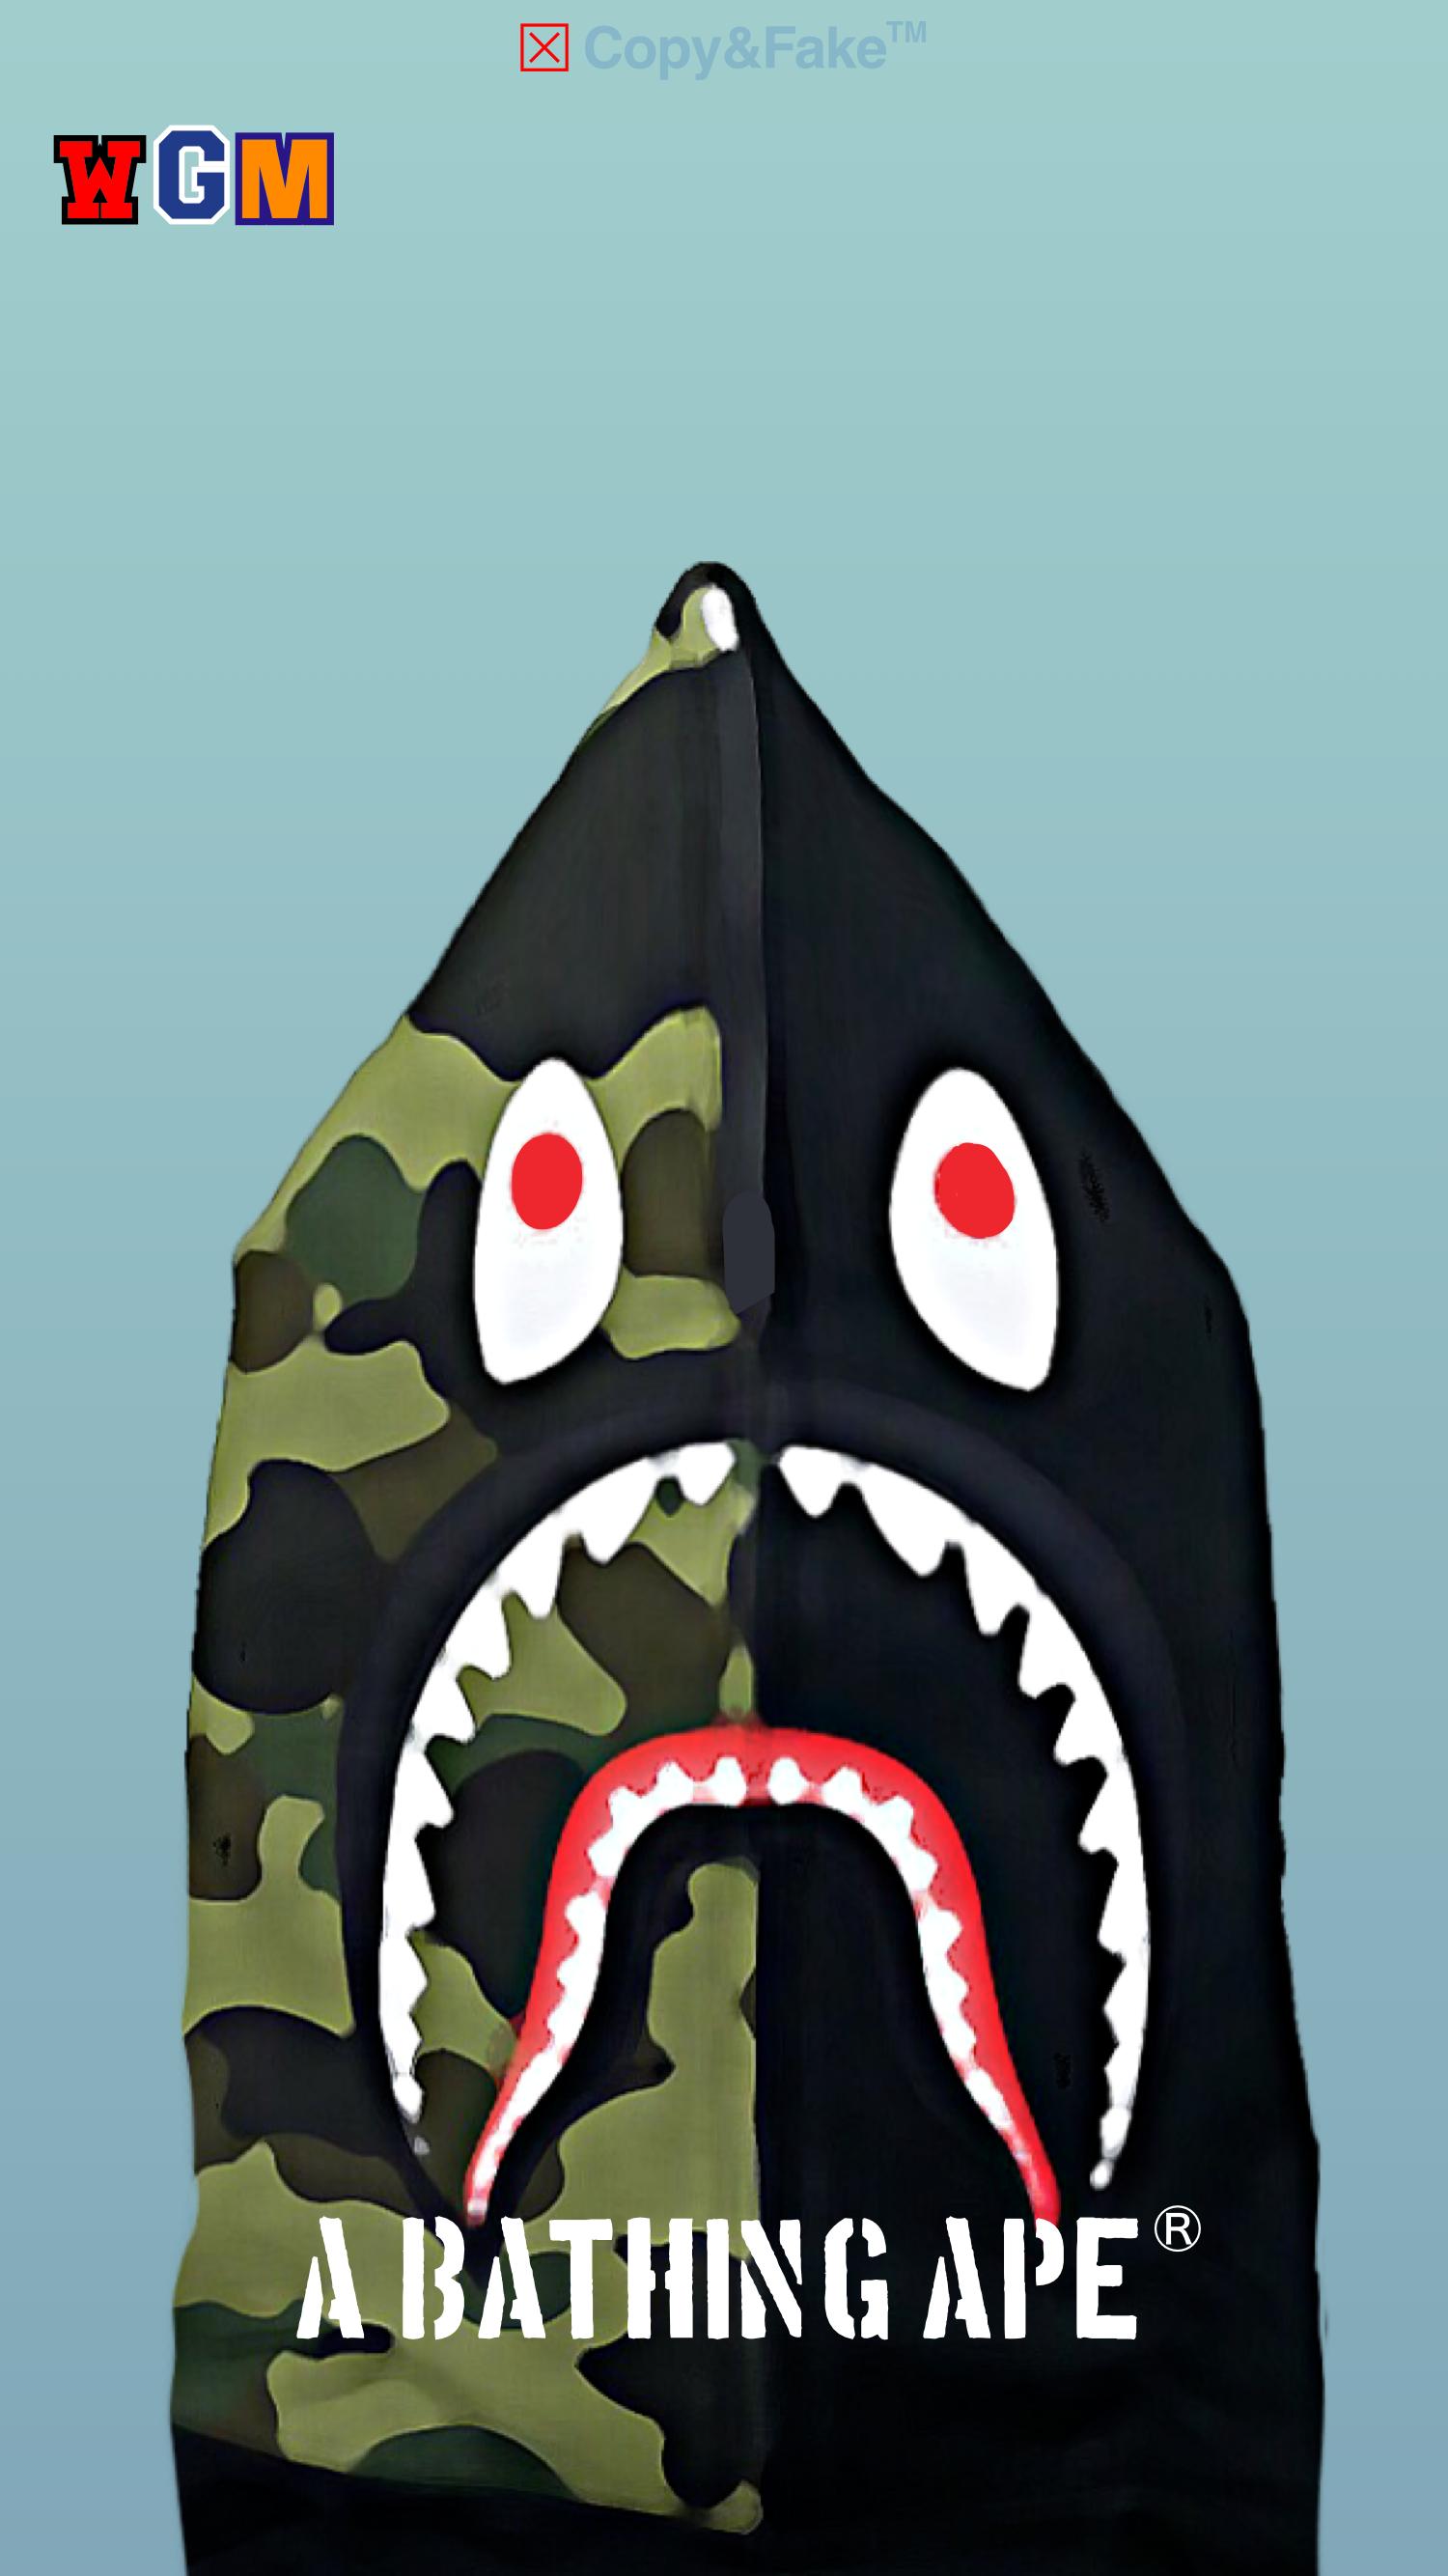 Bape Wallpaper Shark Mouth Bape Wallpapers Hypebeast Wallpaper Hype Wallpaper